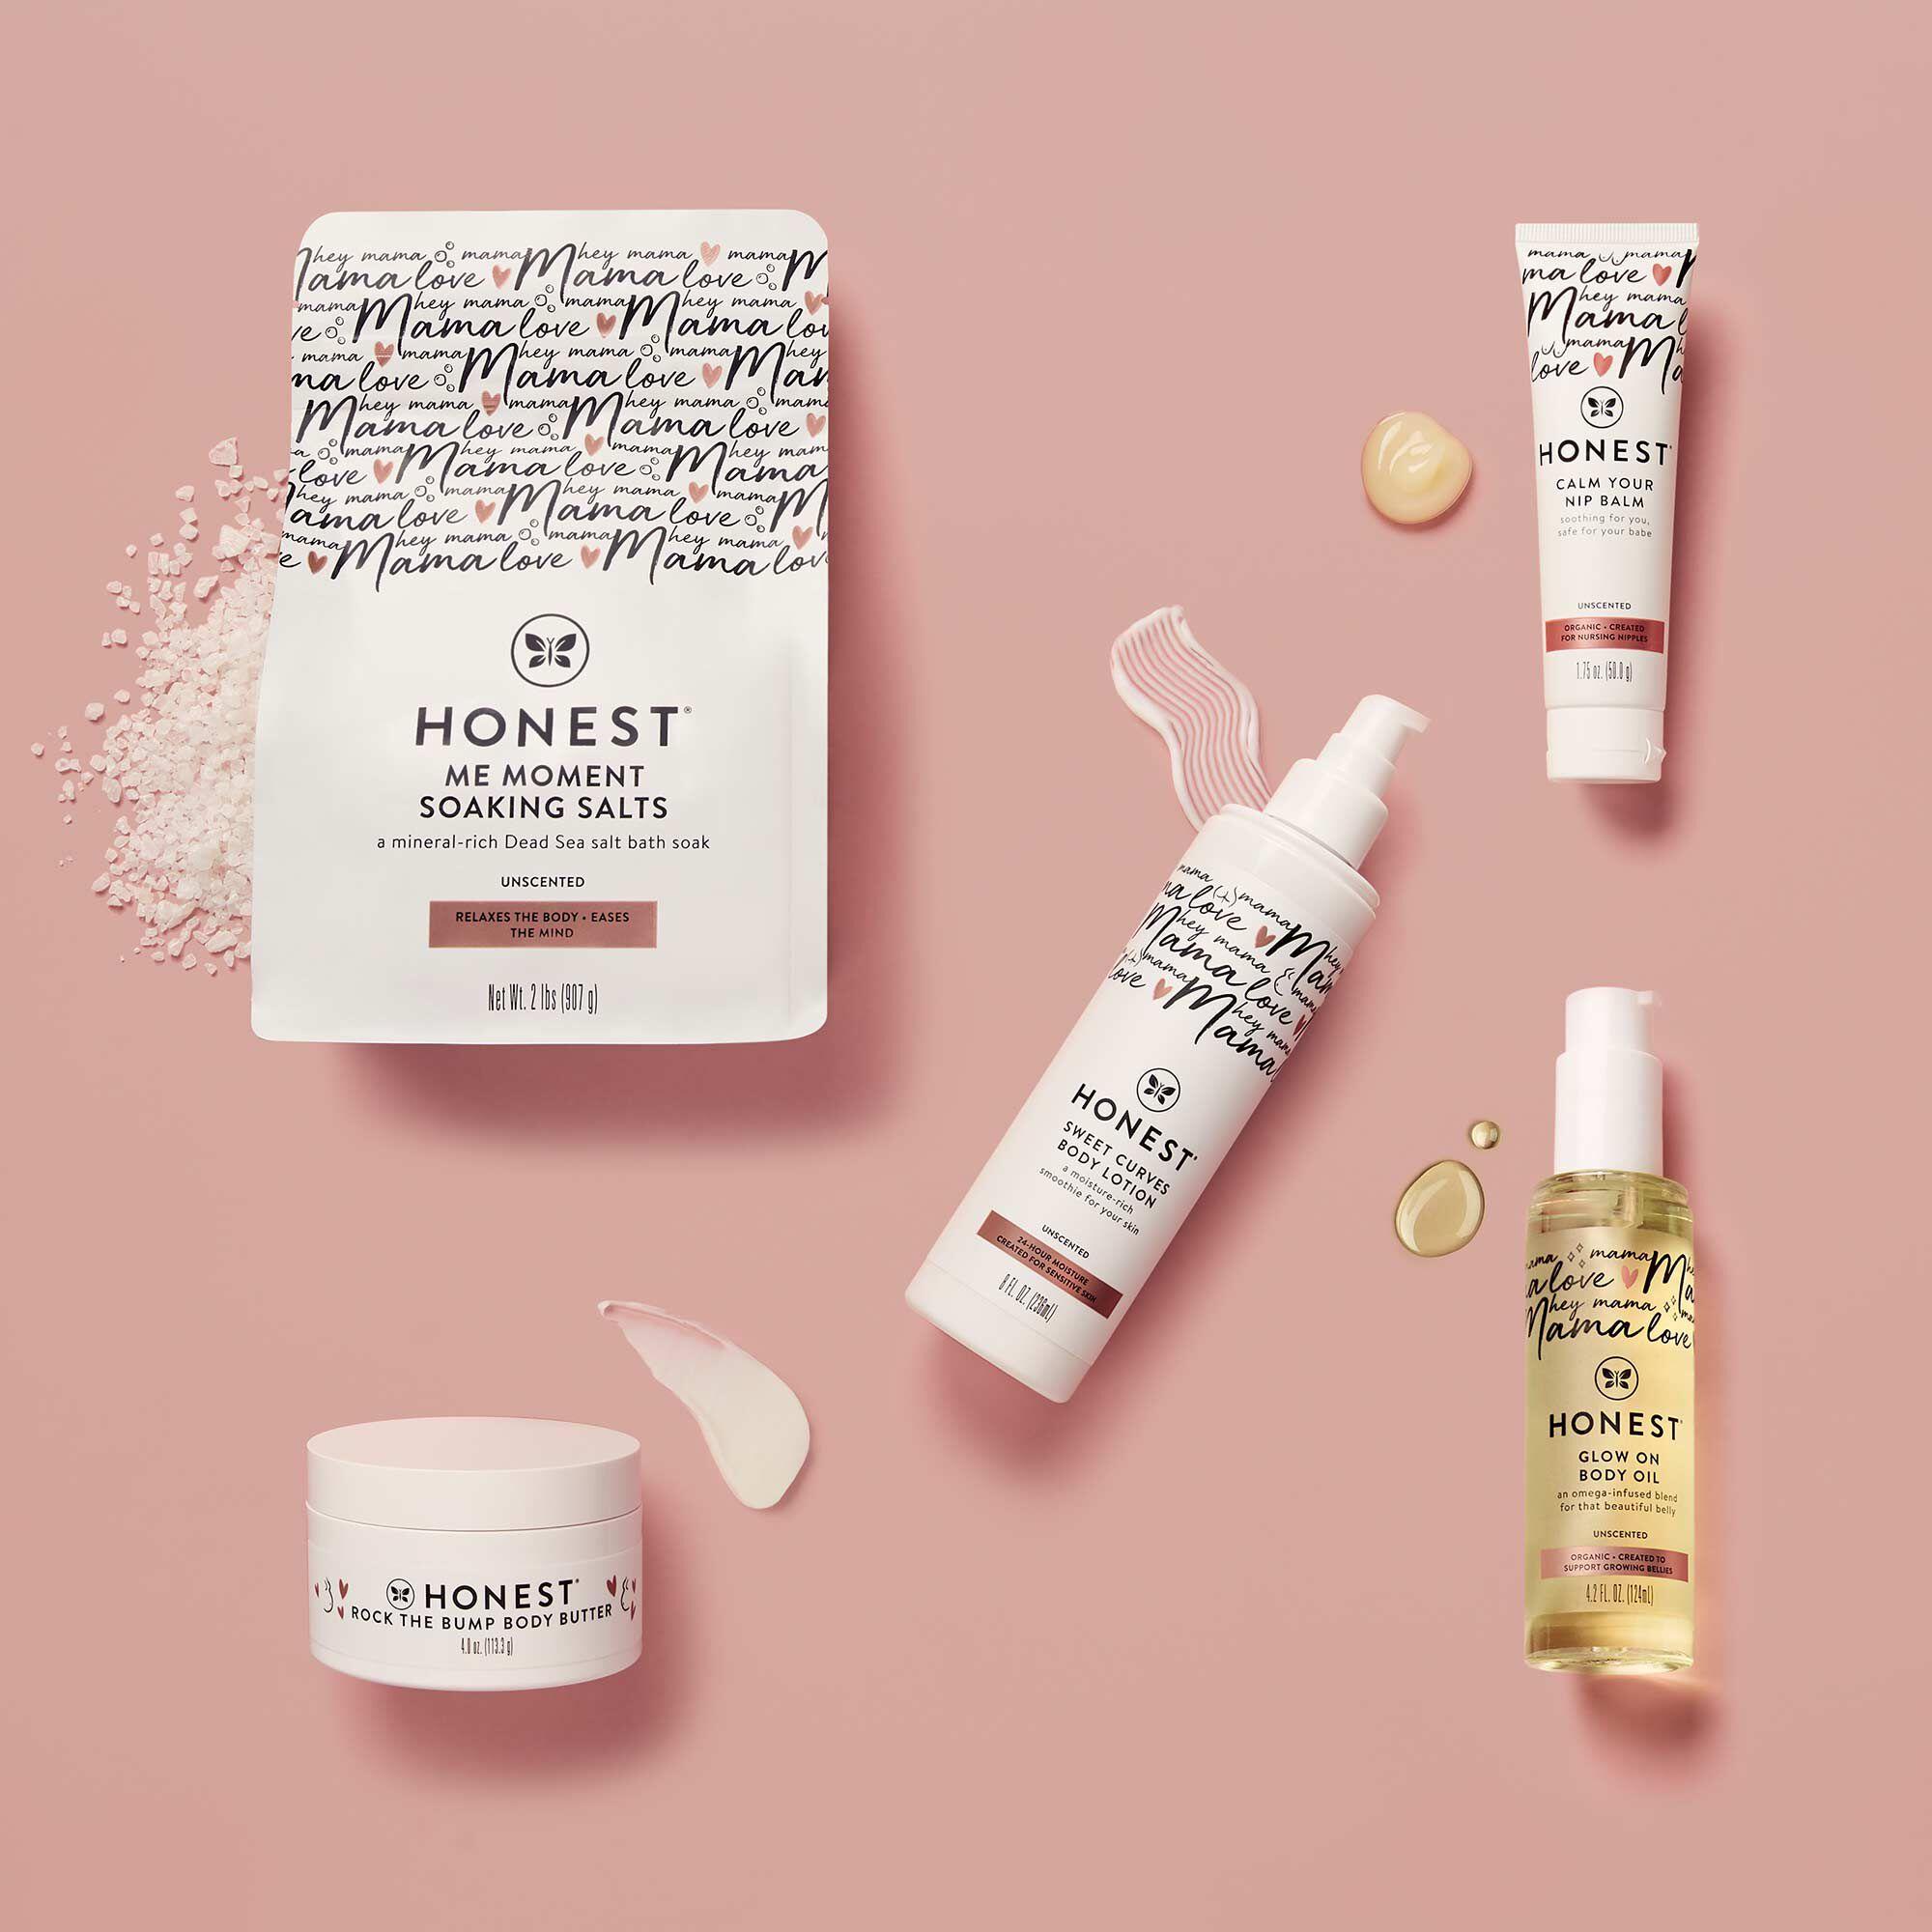 Honest Mama Product Line Flatlay